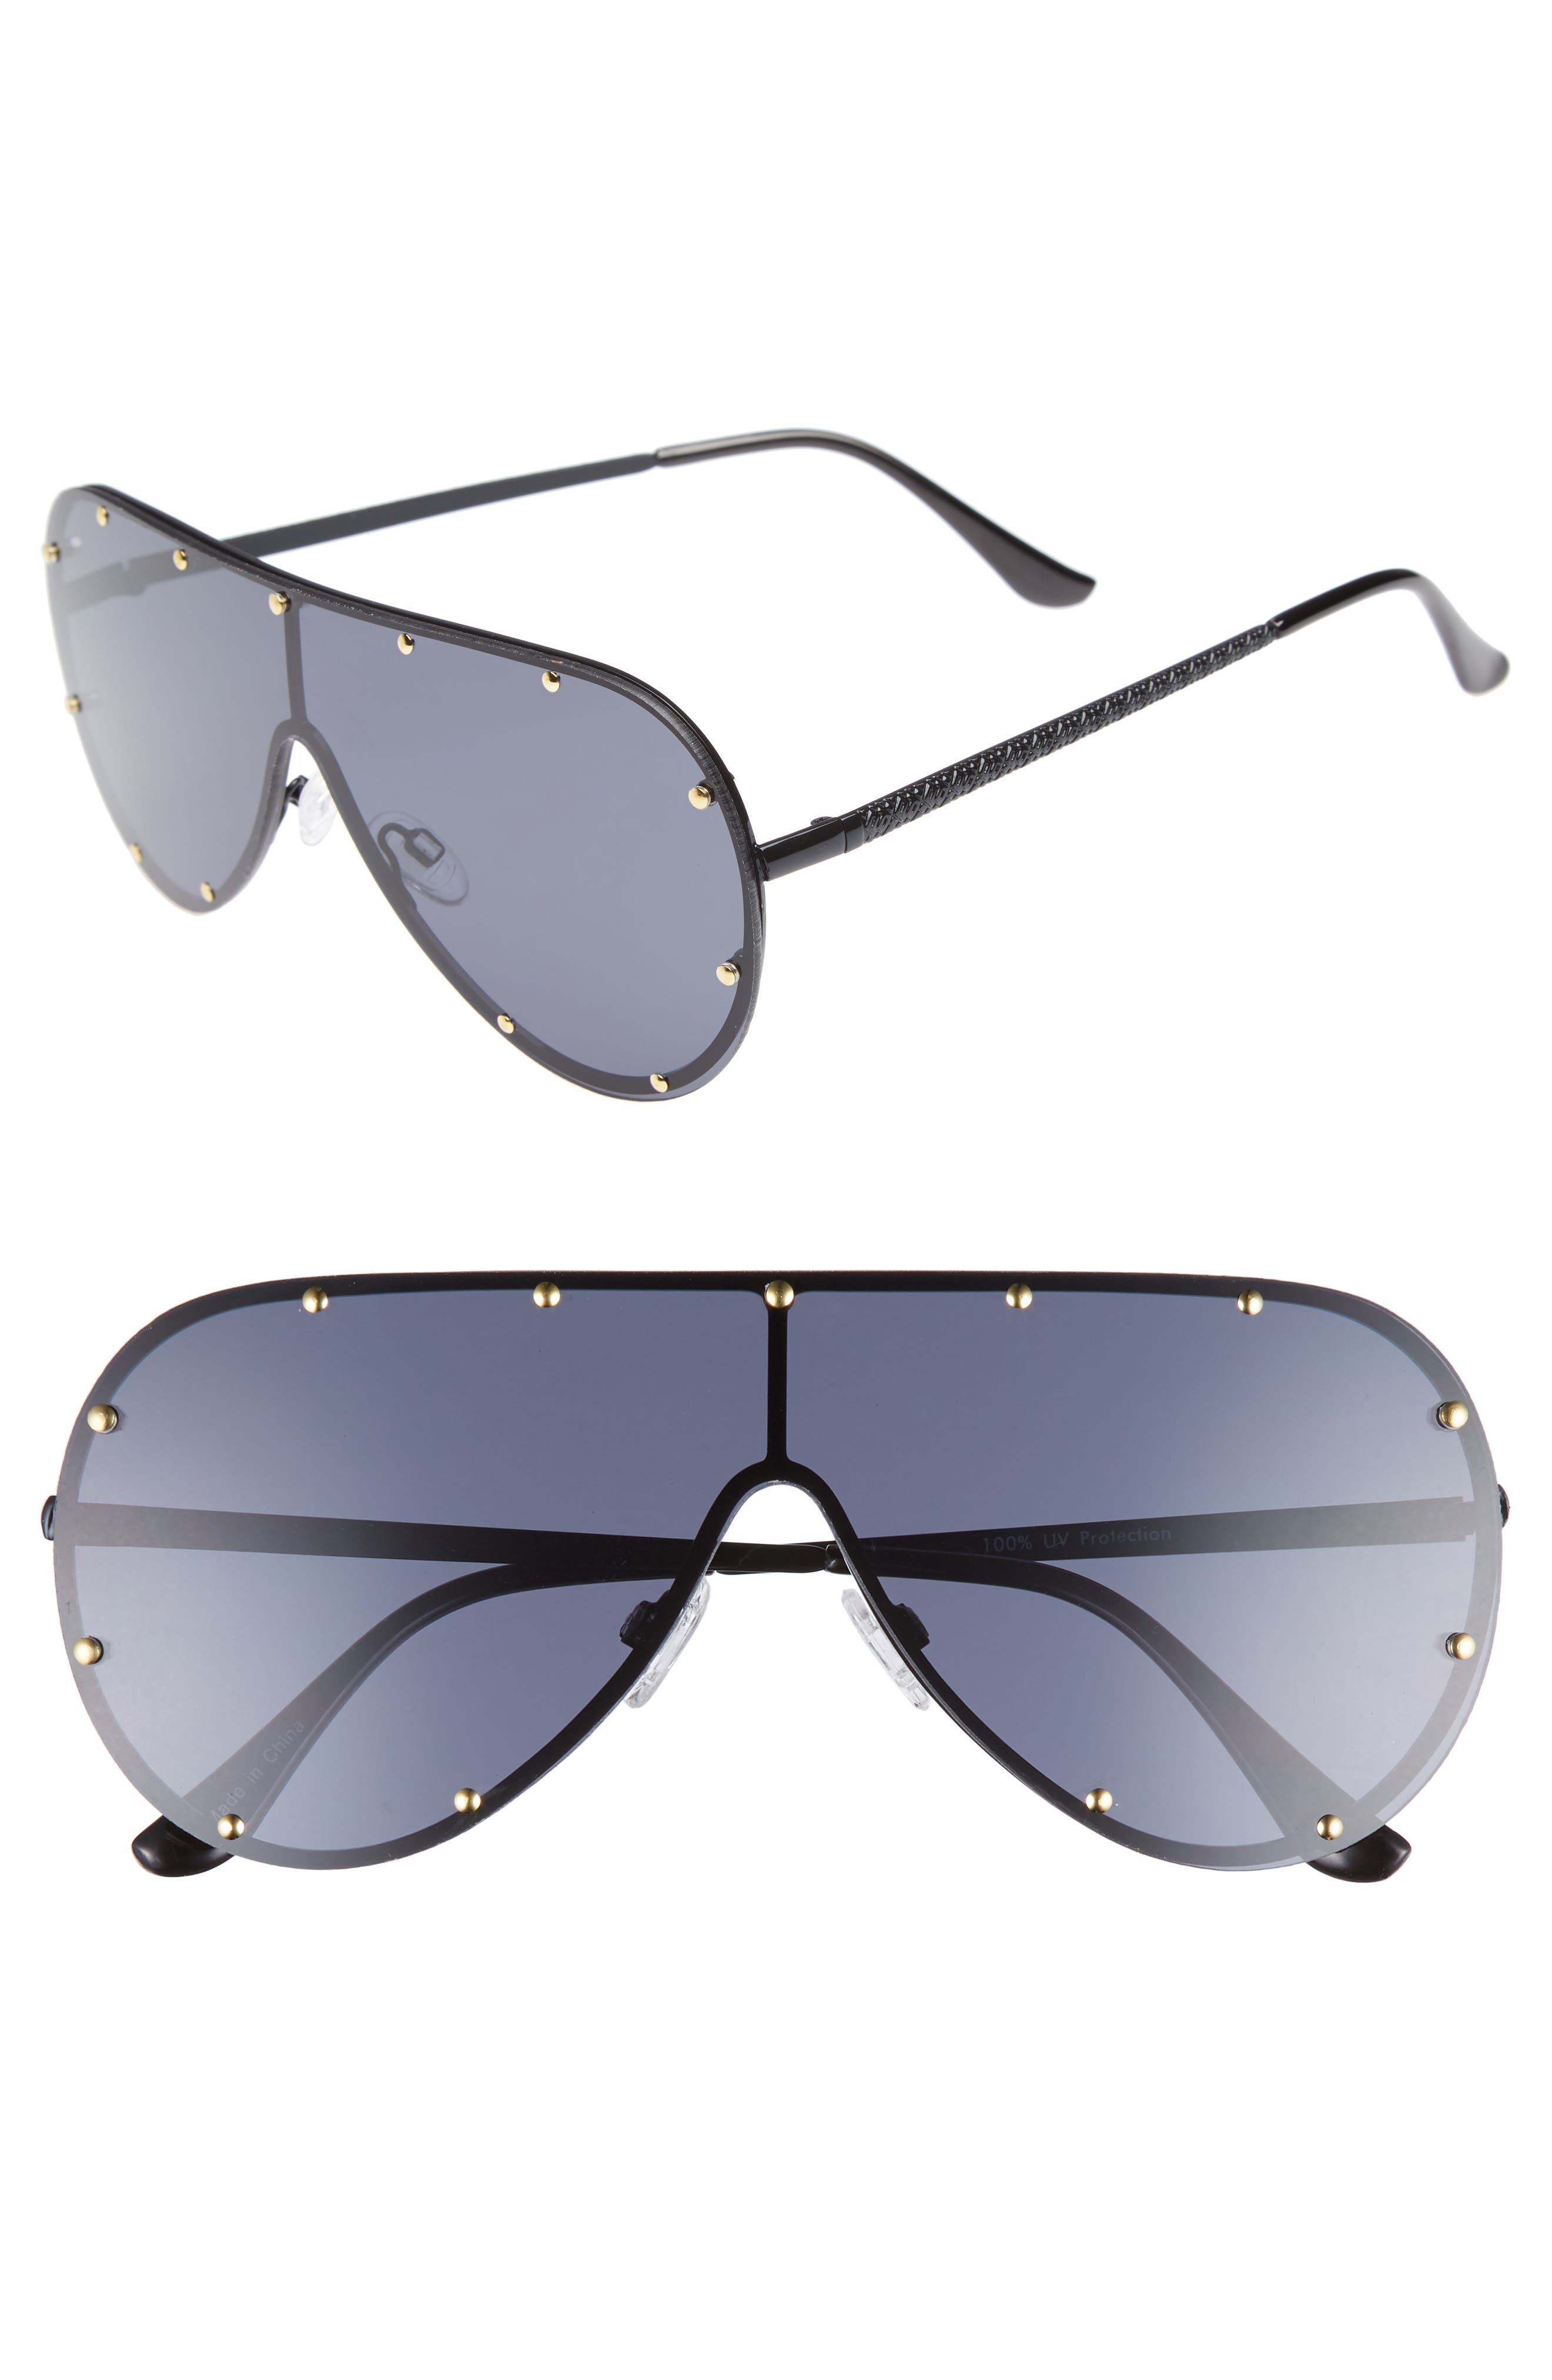 65mm Studded Shield Sunglasses,                         Main,                         color, Black